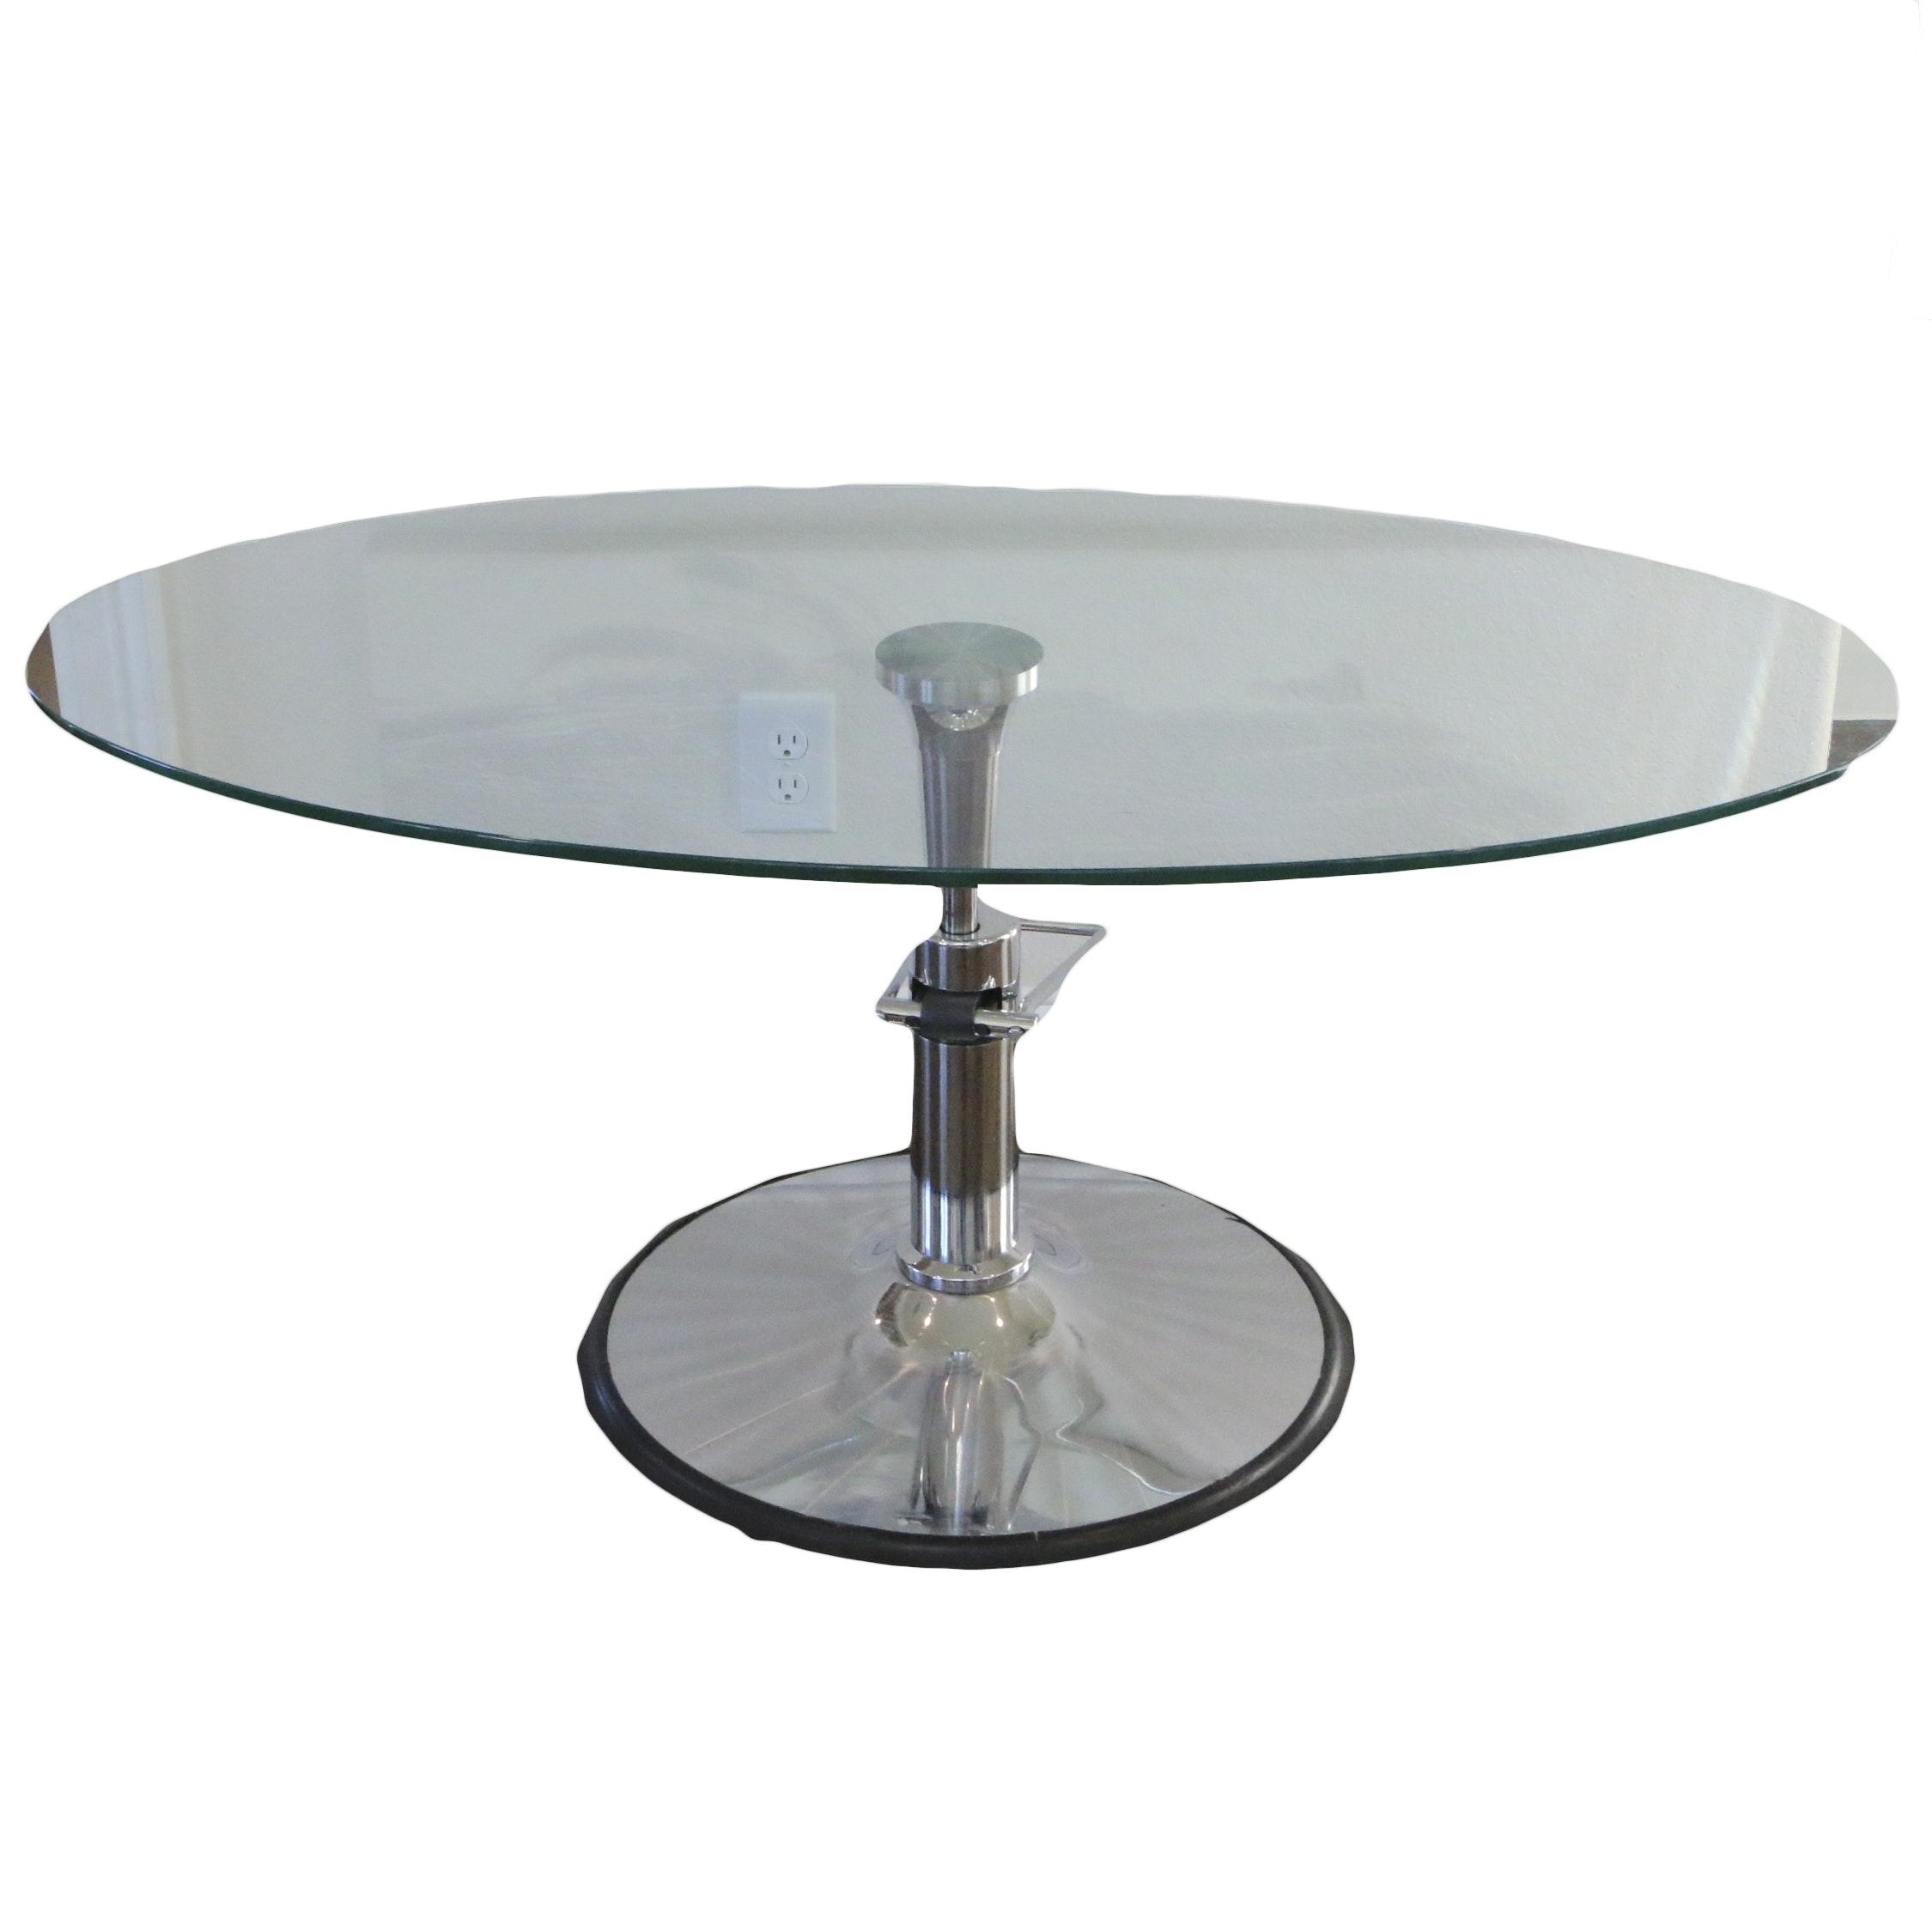 Hydra Design Glass Top Adjustable Coffee Table